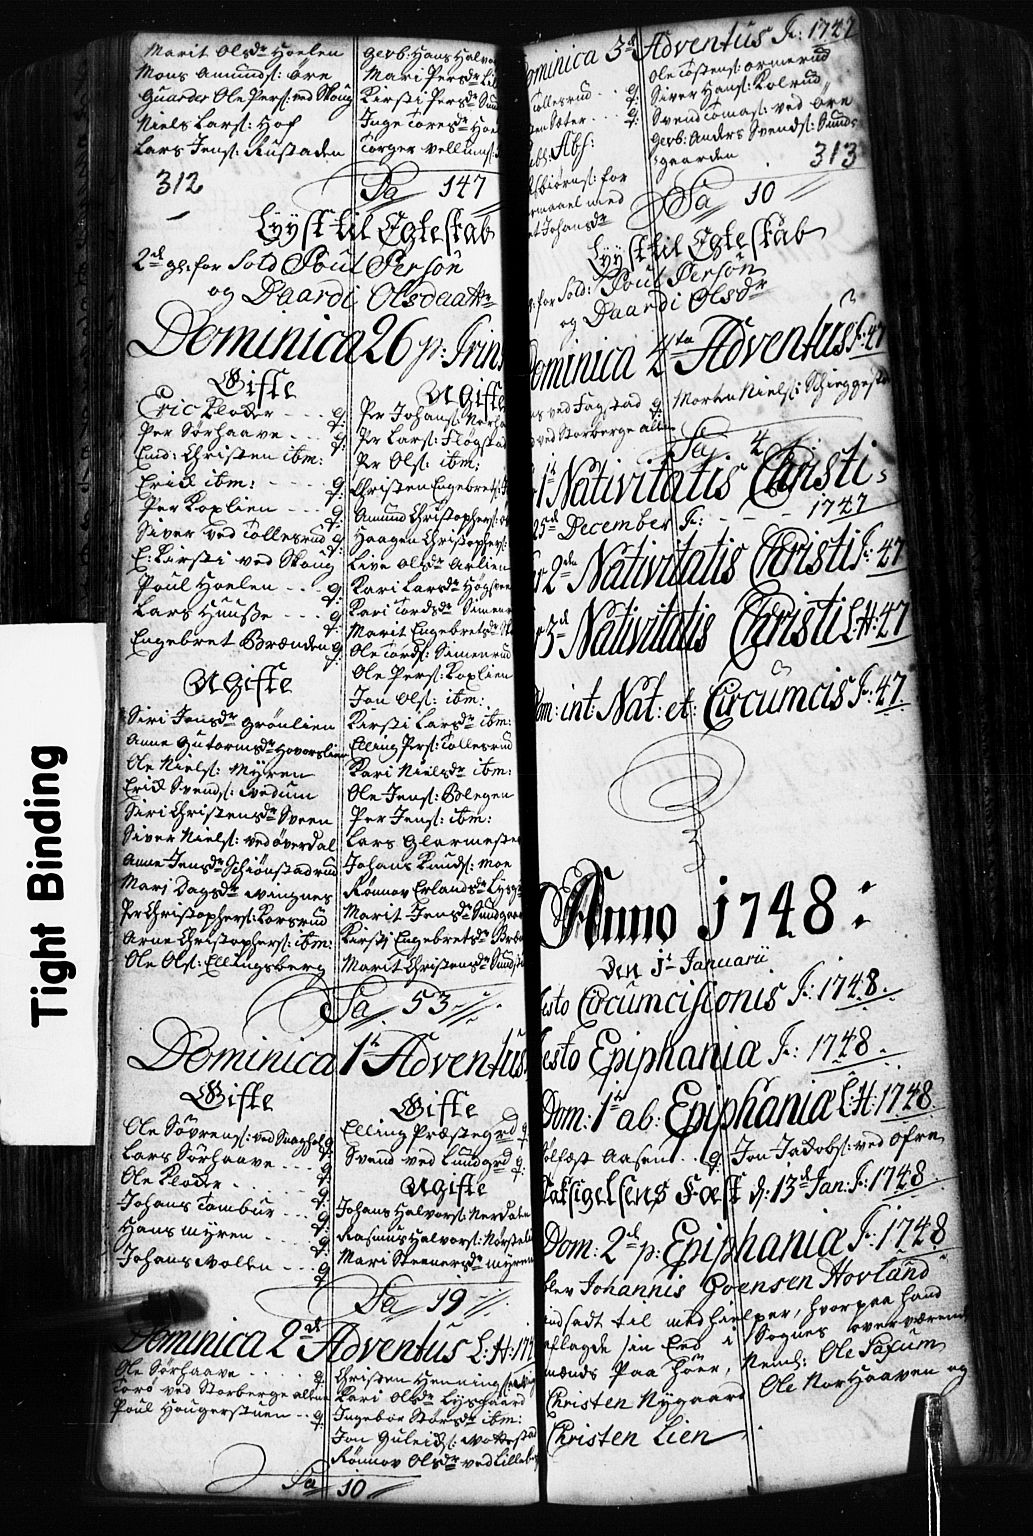 SAH, Fåberg prestekontor, Klokkerbok nr. 2, 1741-1756, s. 312-313